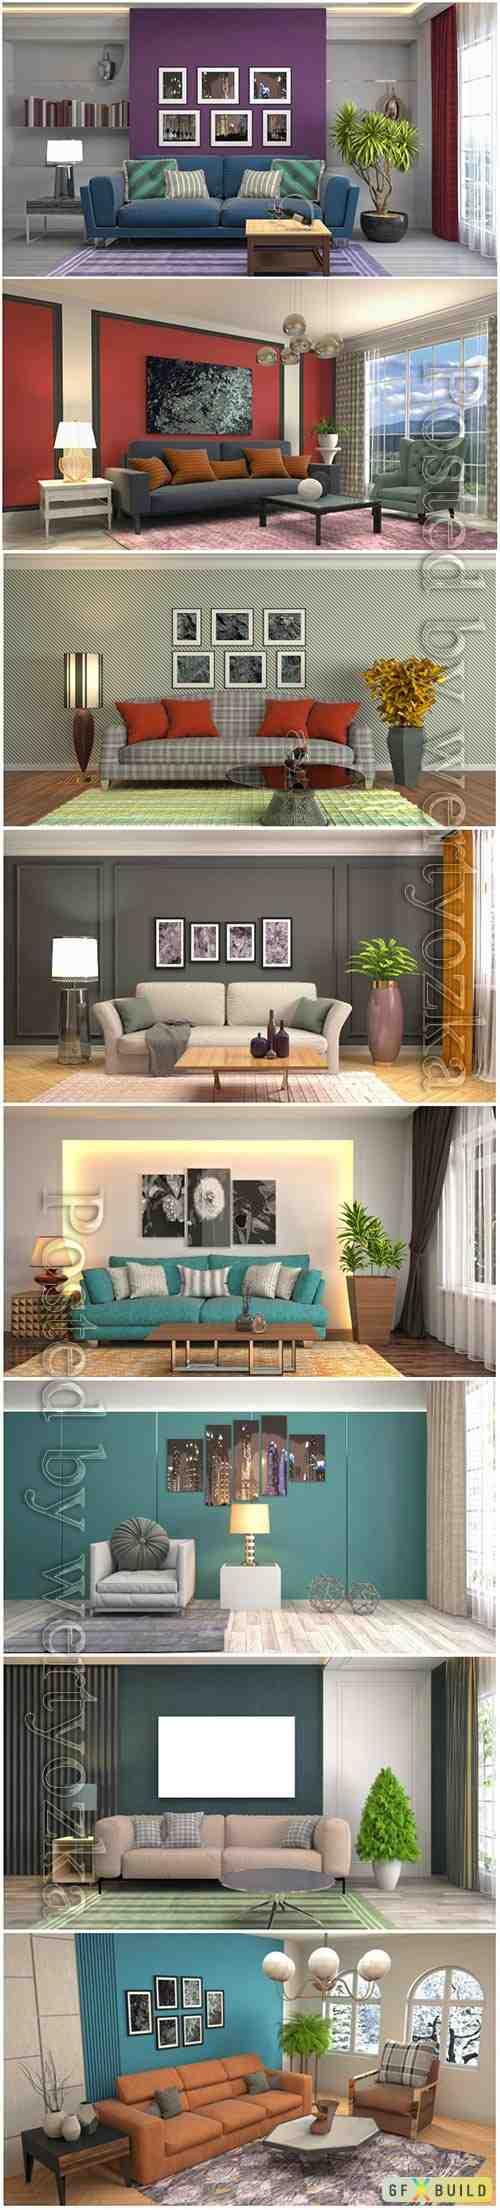 Illustration of the living room interior photo